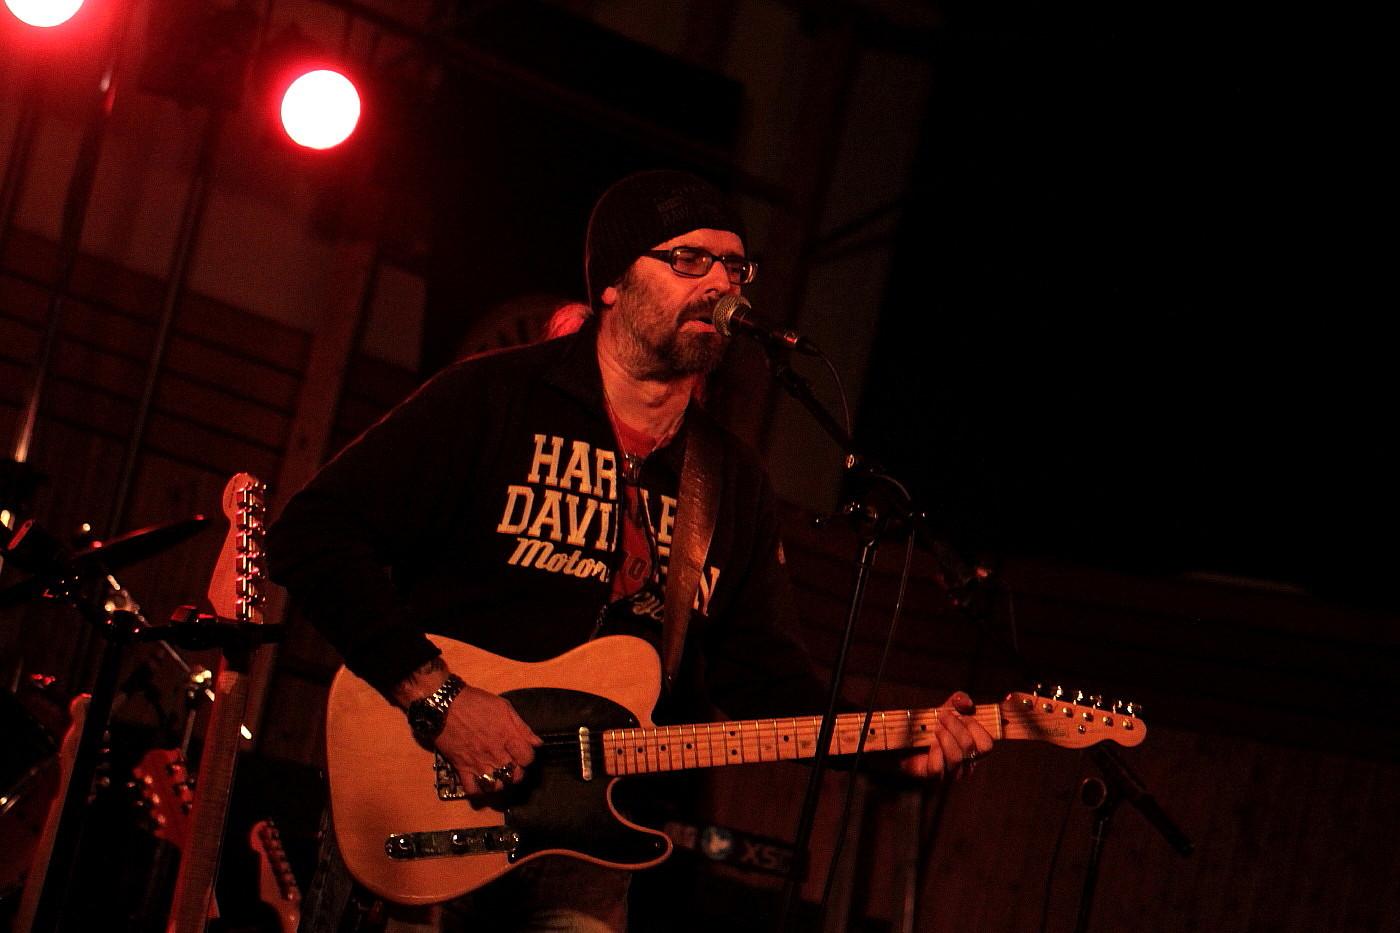 6. Mülsner Rock & Blues Nacht : Peter Schmidt